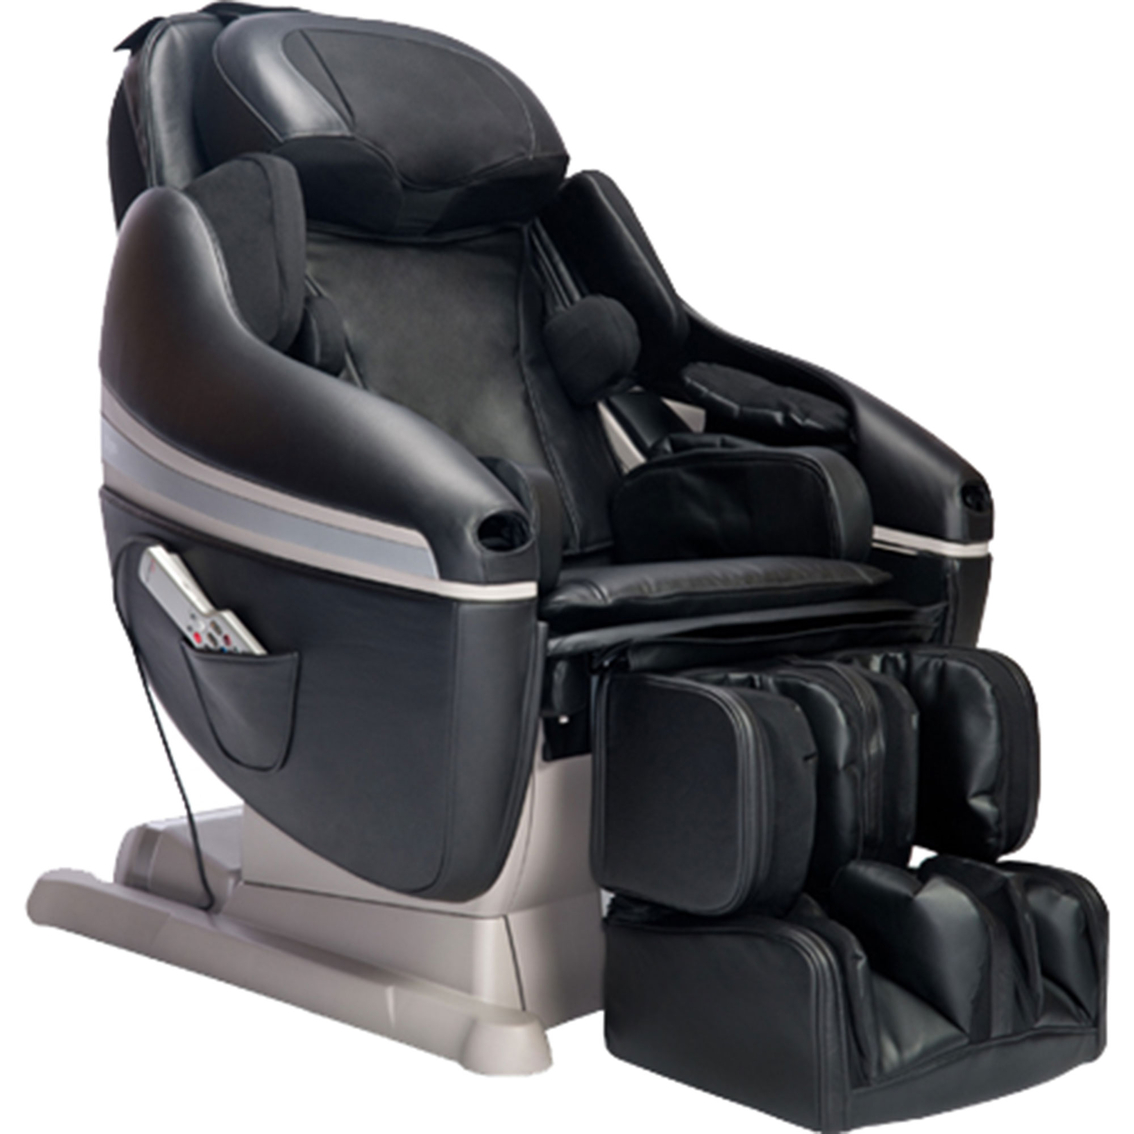 Inada Sogno Dreamwave Massage Chair Black  Chairs